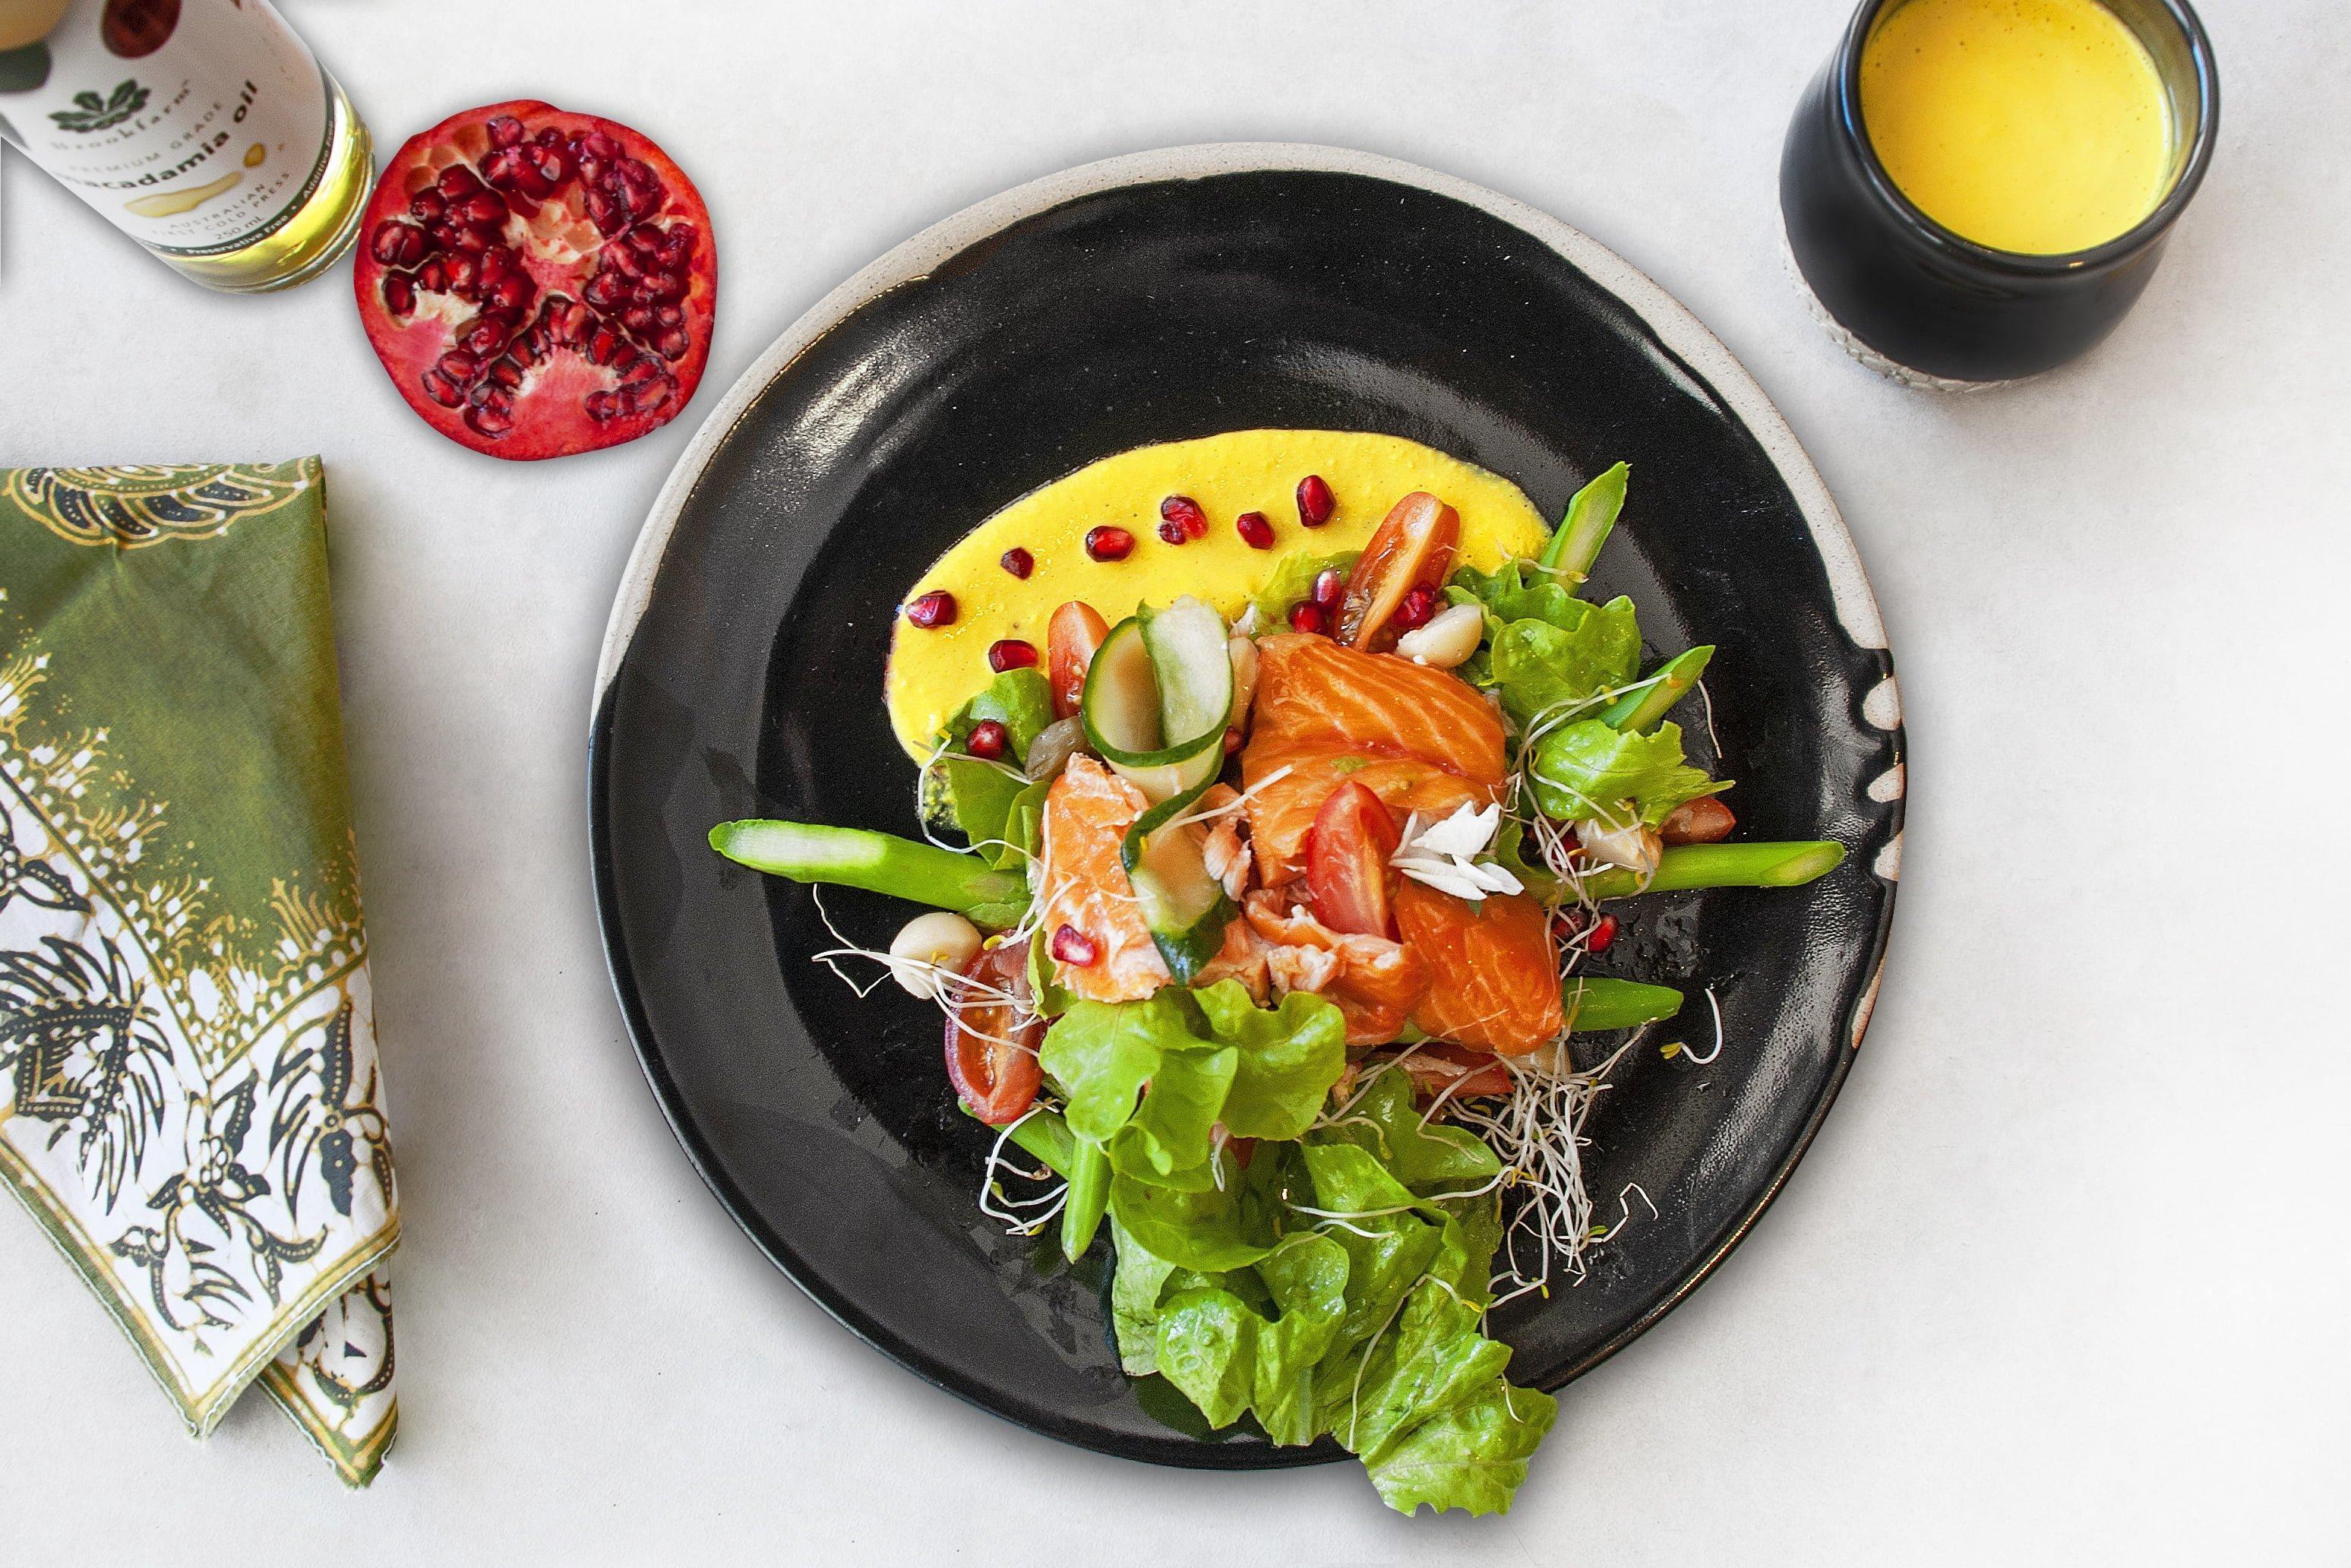 Trout Salad with Turmeric & Premium Macadamia OilDressing